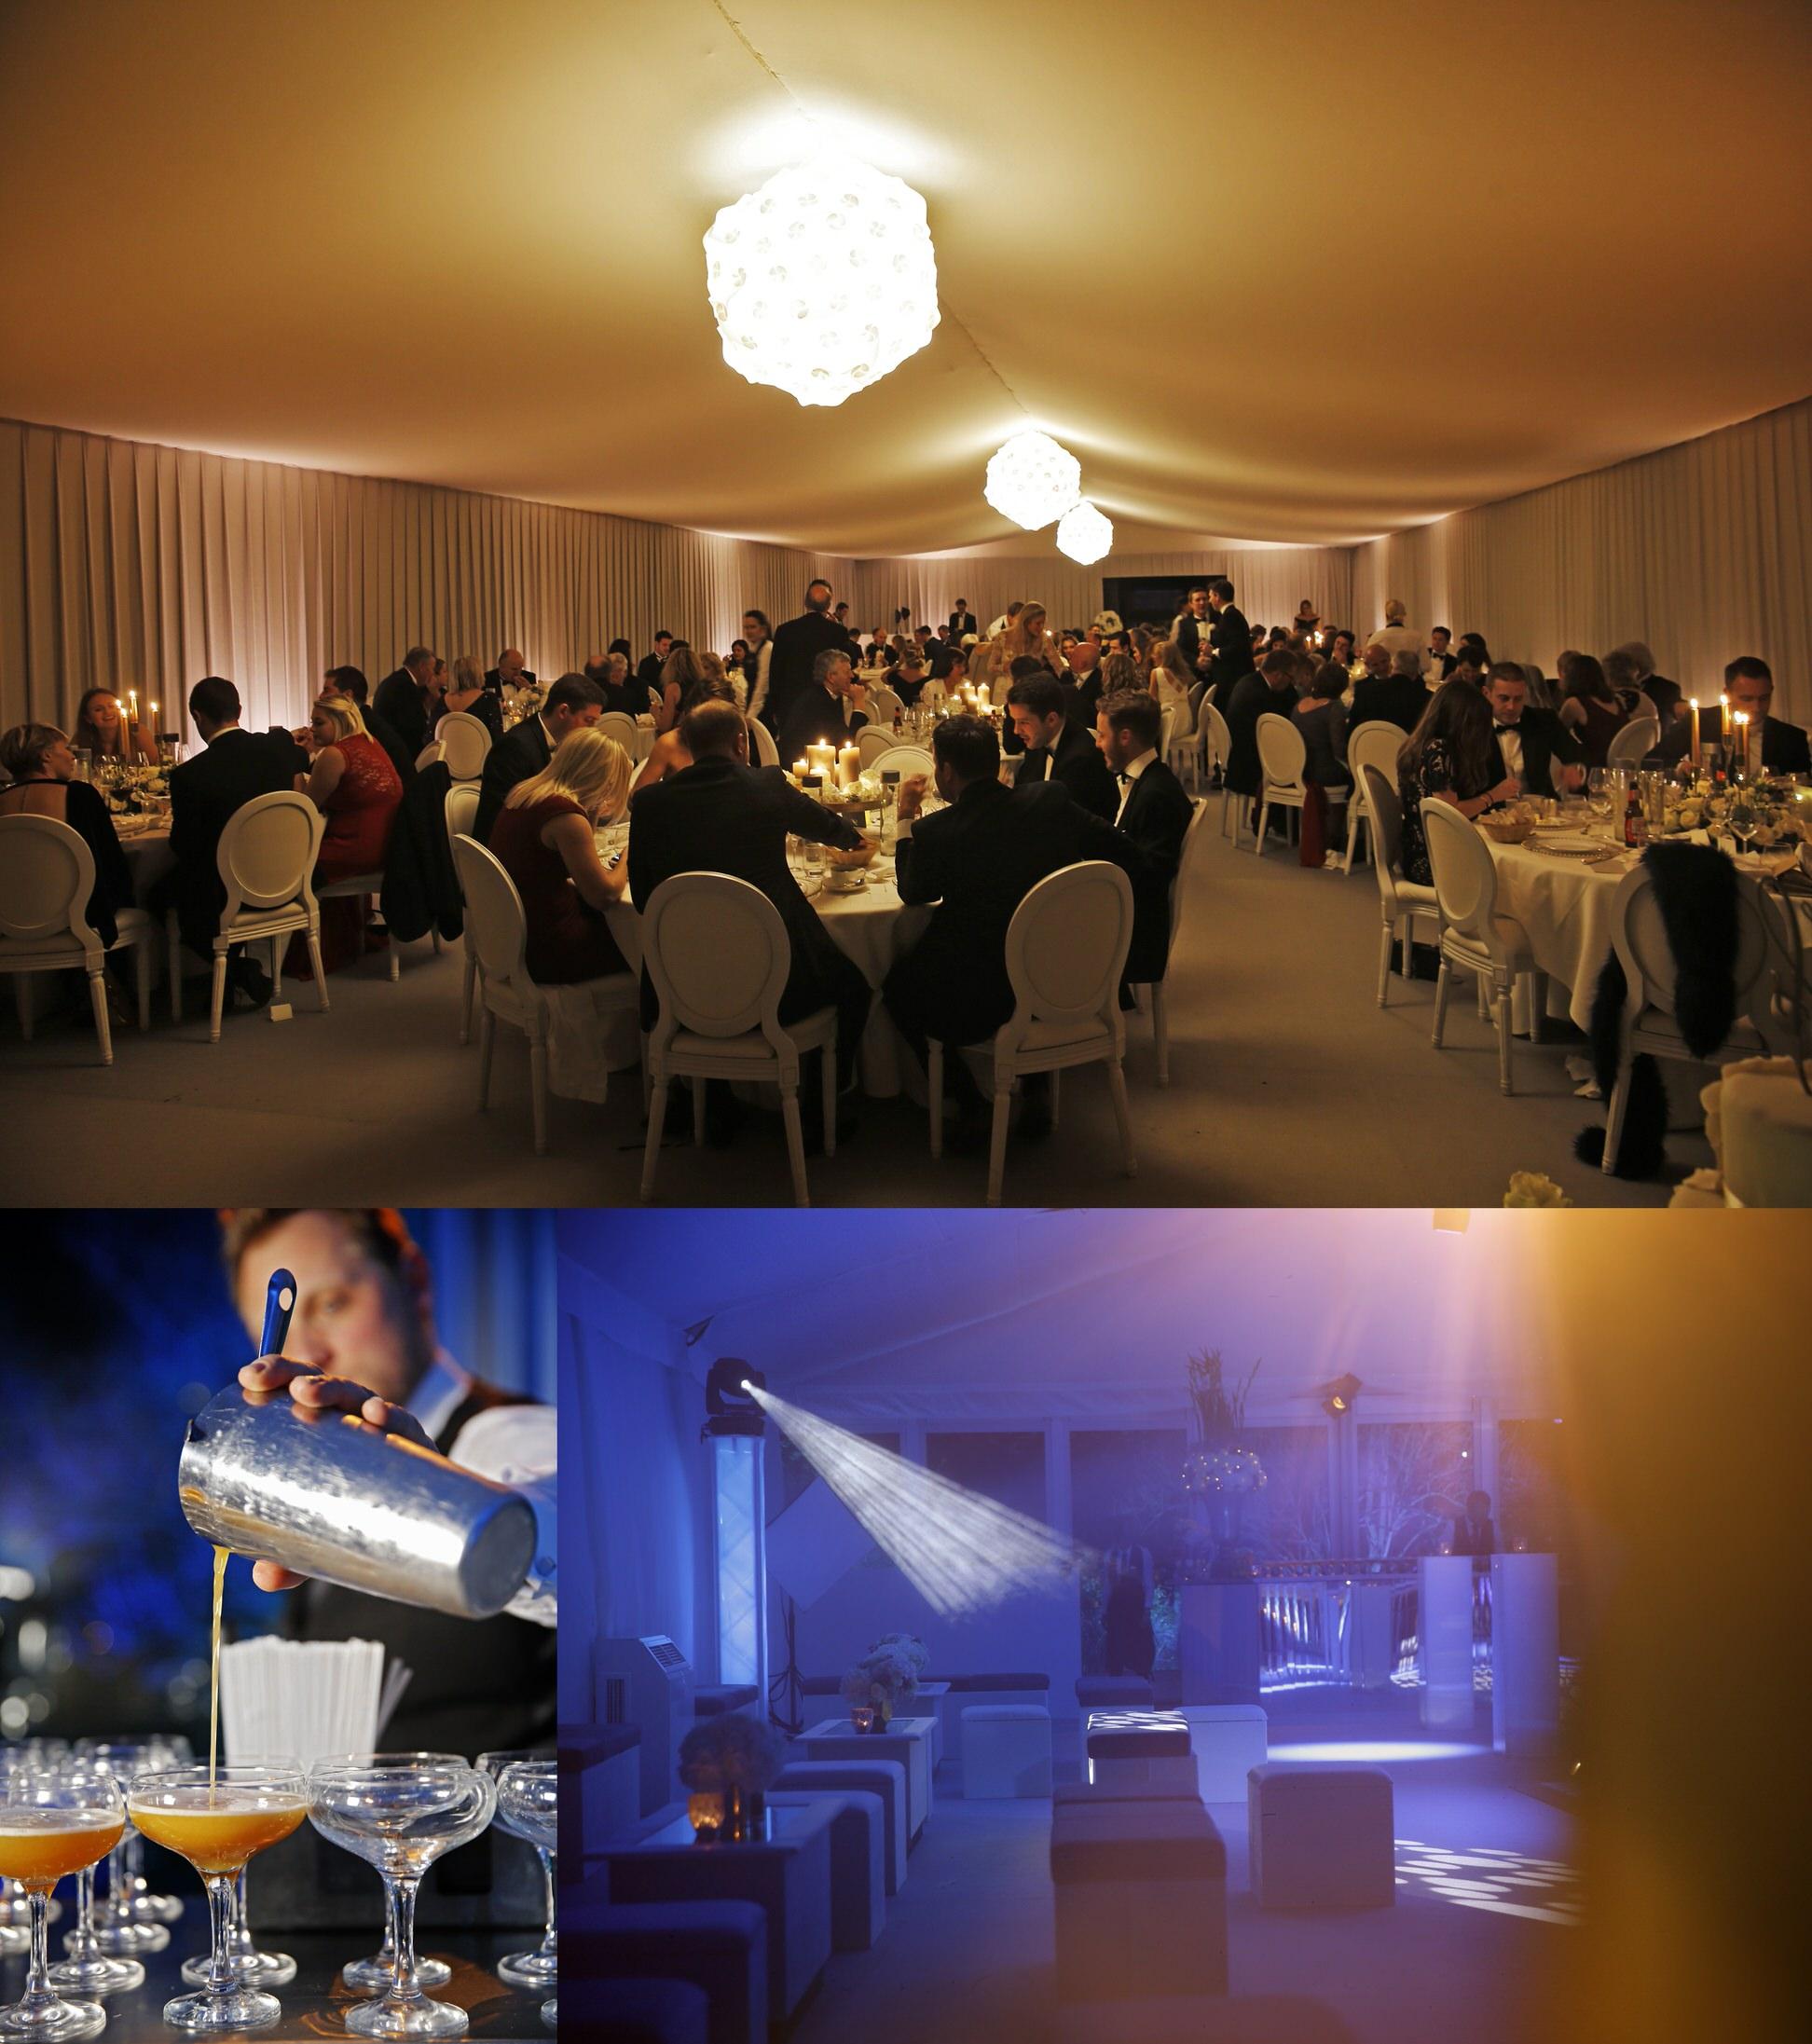 brett-harkness-winter-wedding-uk-wedding-photographer_0020.jpg